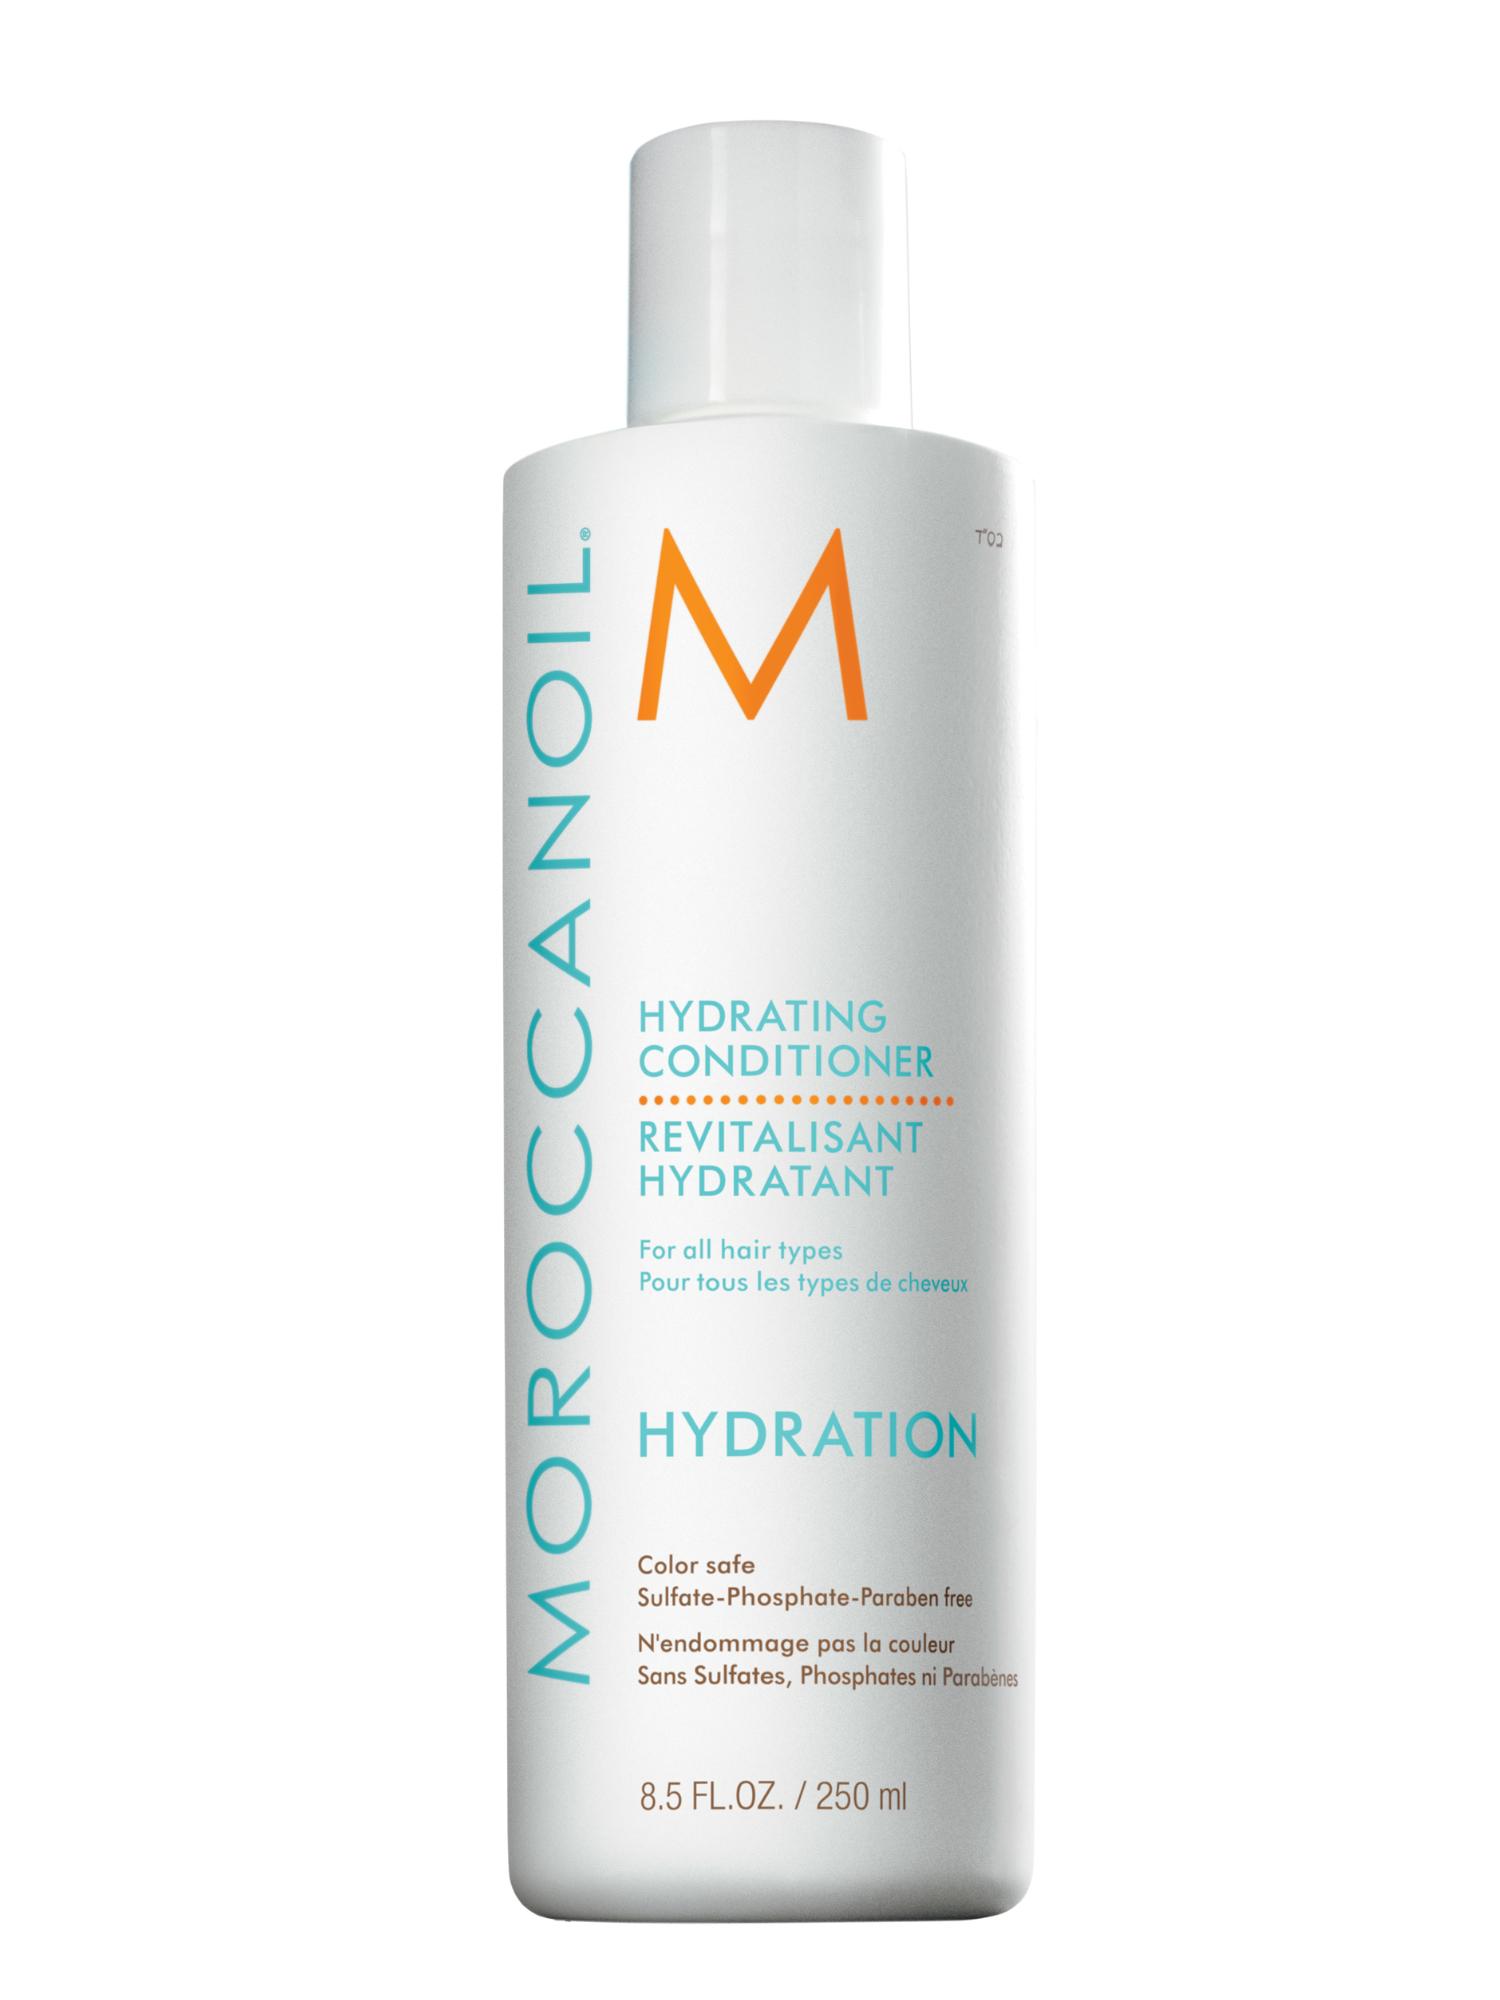 Kondicionér pro hydrataci vlasů Moroccanoil Hydration - 250 ml (FMC-HYDC250, HYDC250) + DÁREK ZDARMA